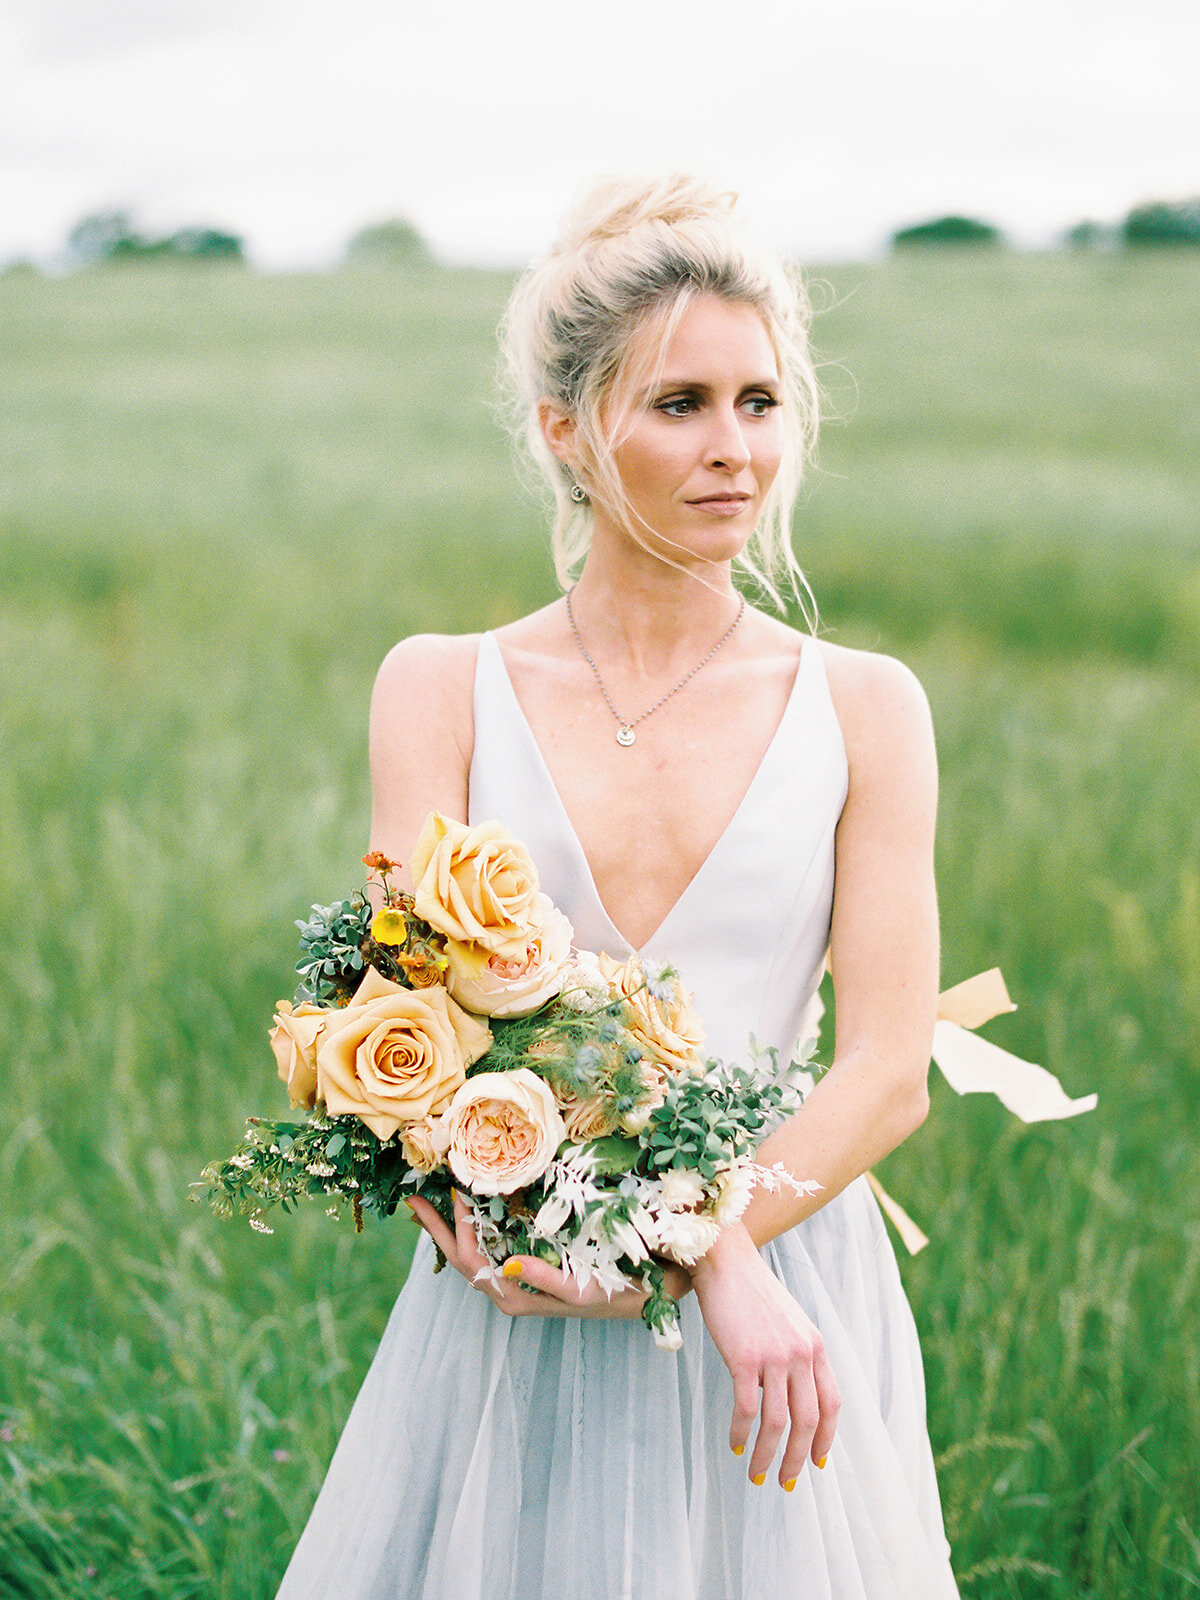 Elegant Countryside Wedding Flowers for Bride